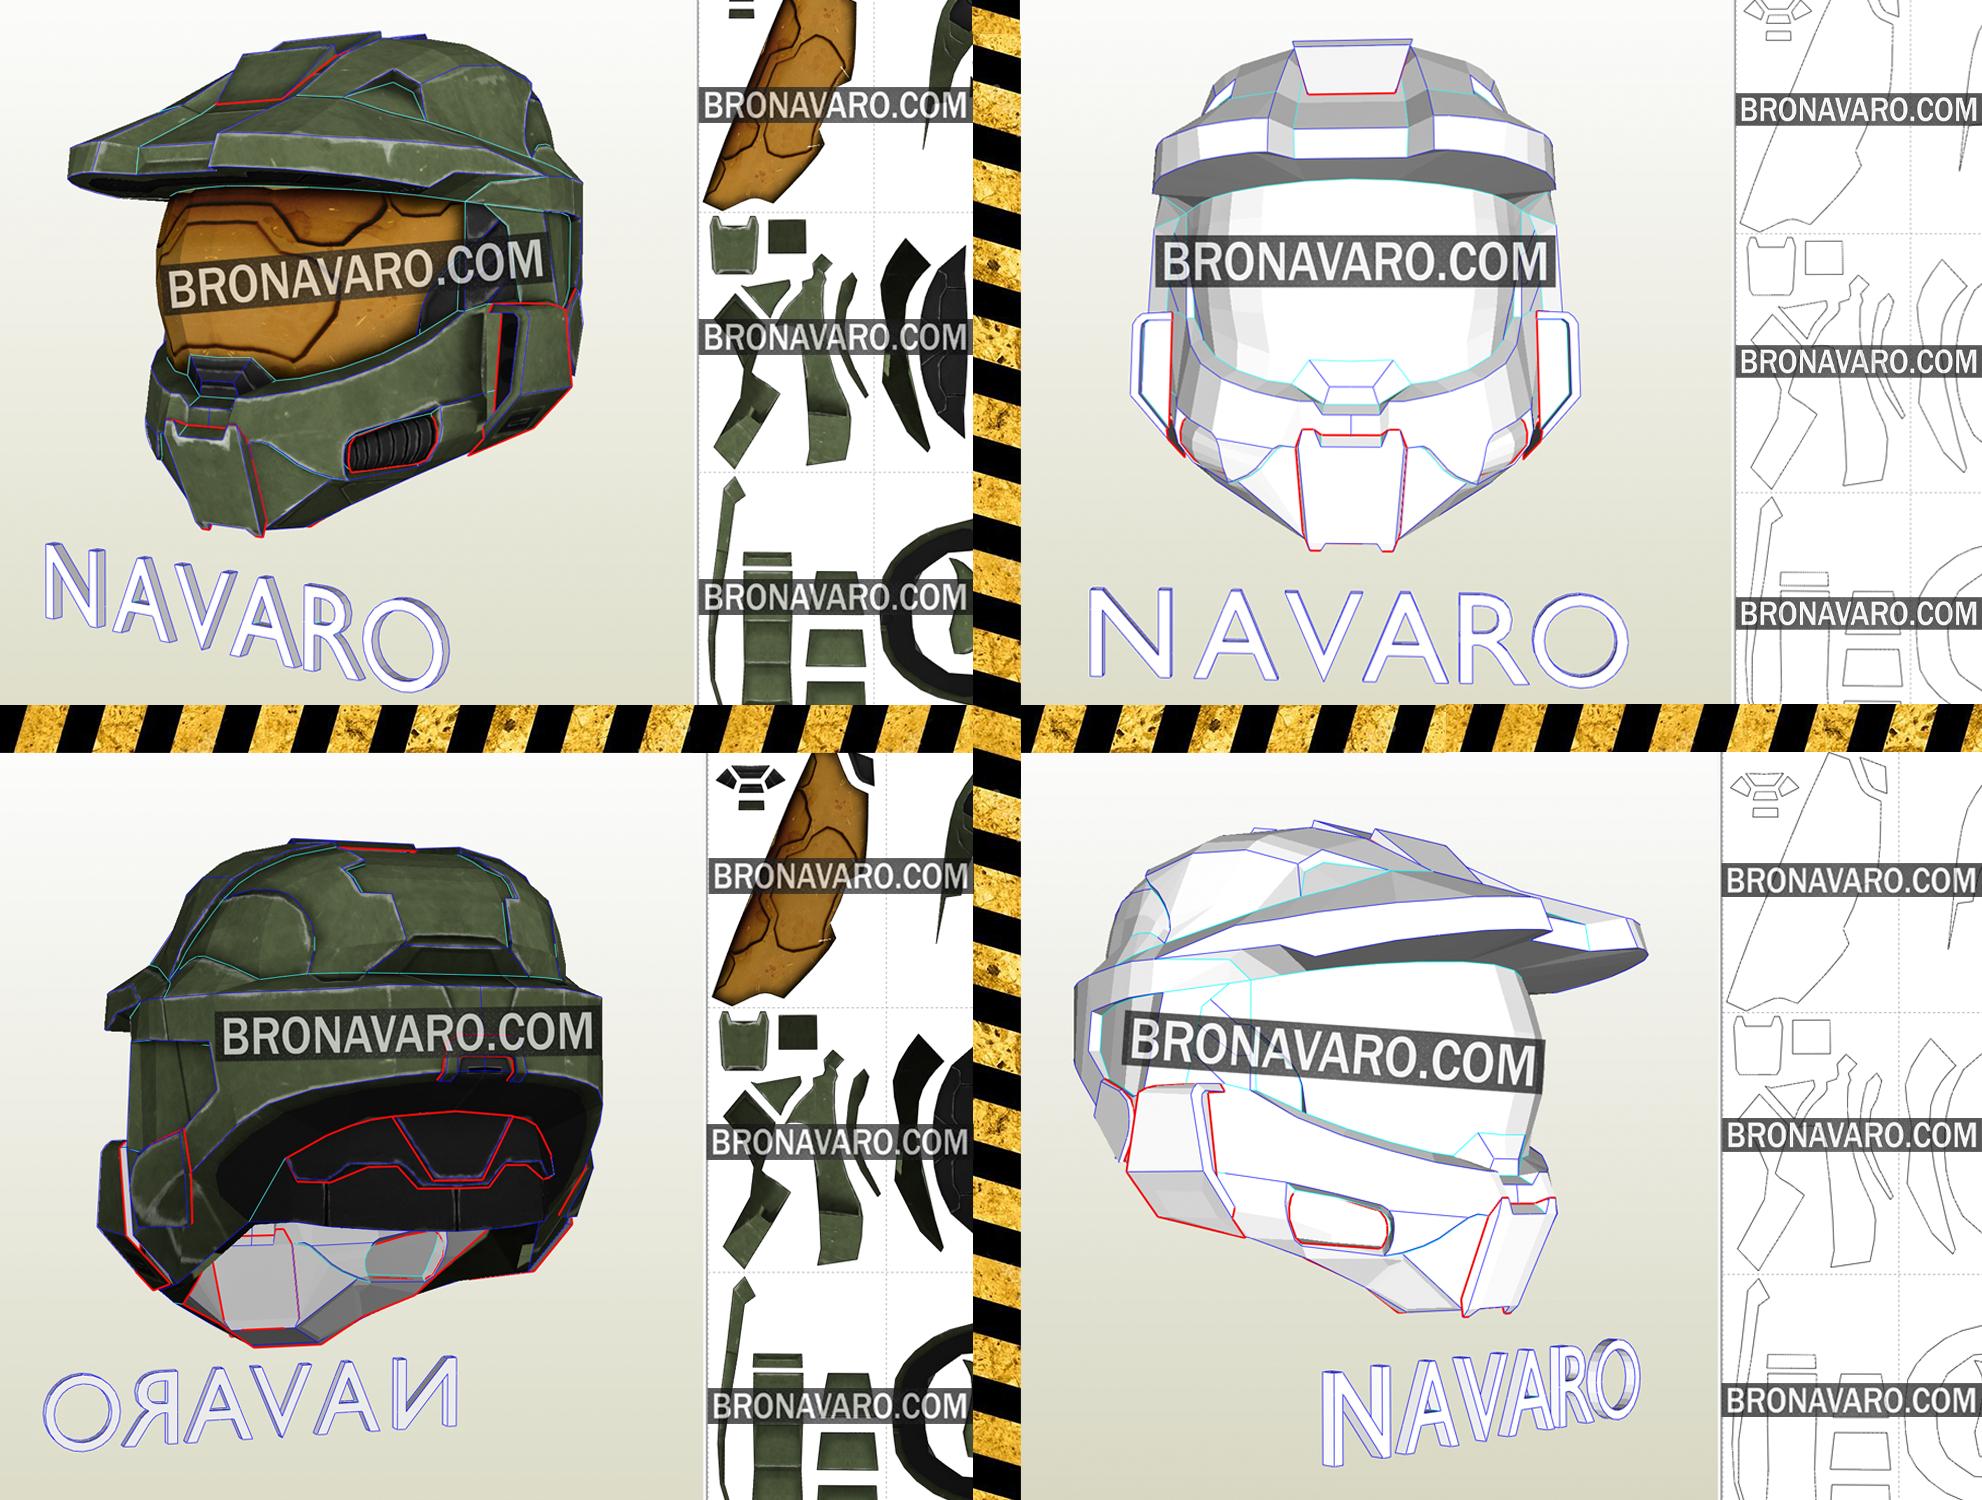 Master Chief Helmet Foam Template Halo 3 Cosplay Helmet Master Chief Helmet Pattern Halo 3 Helmet Pepakura Master Chief Cosplay Pepakura Helmet Halo Cosplay